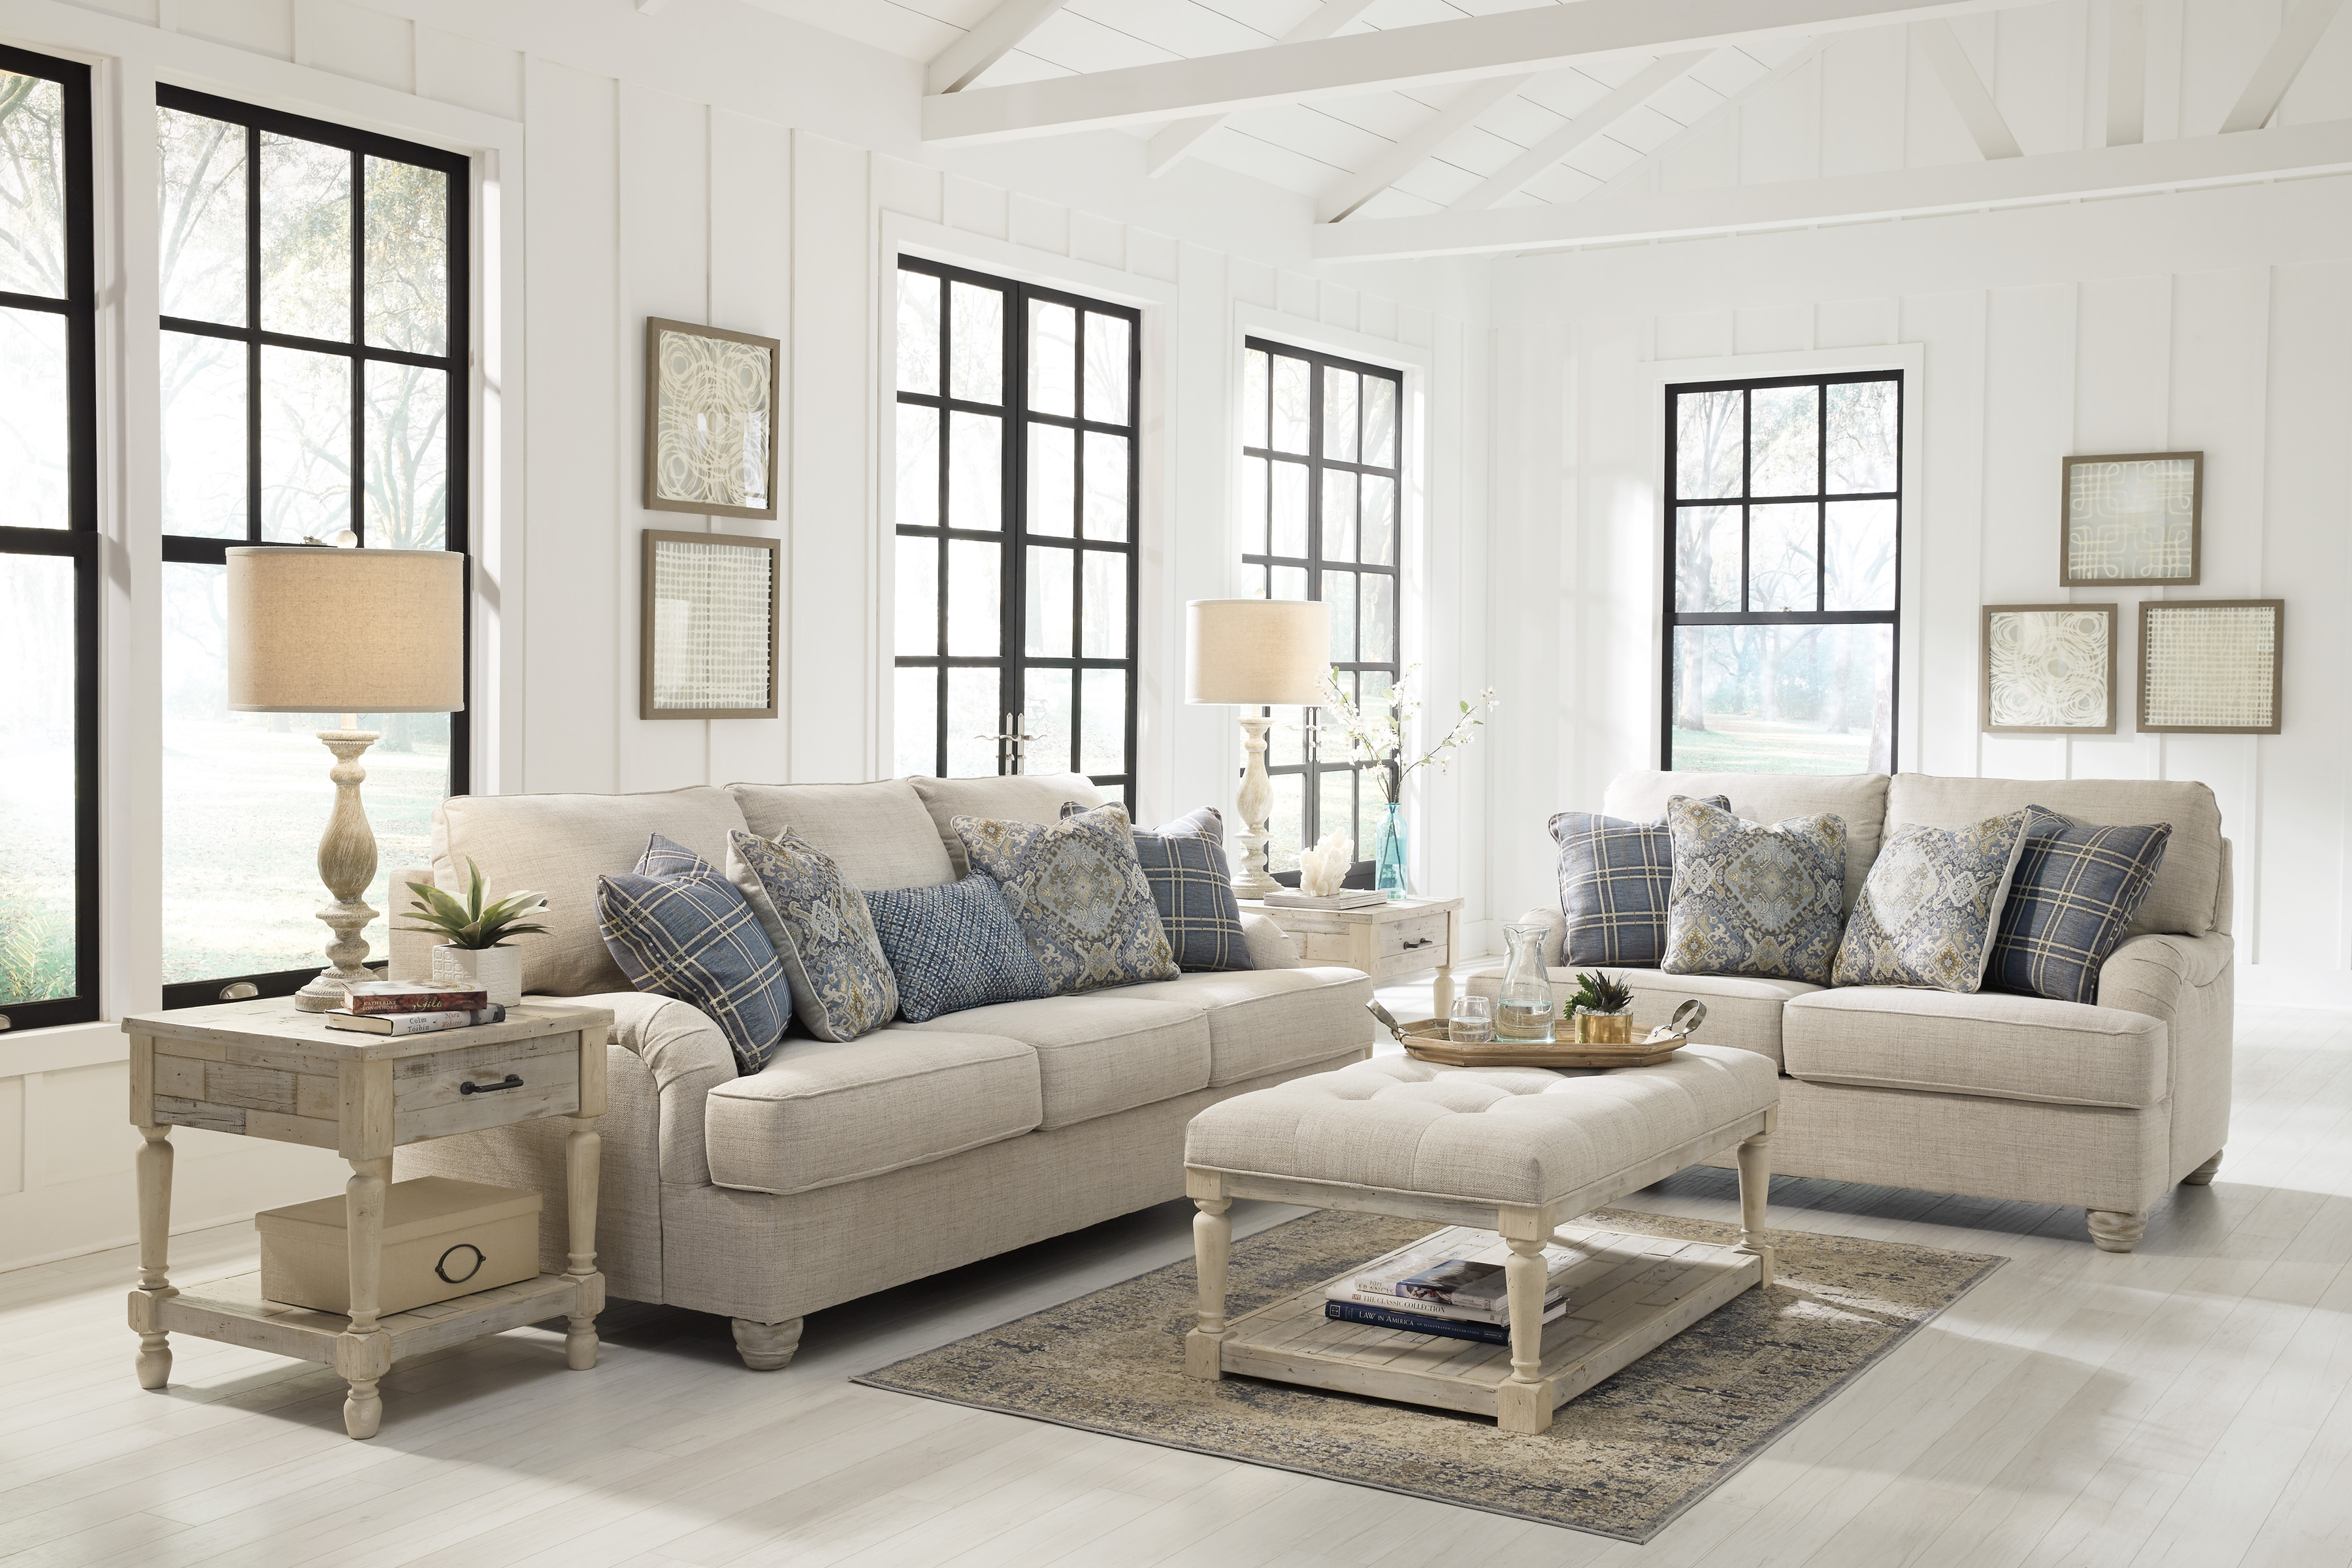 Benchcraft® Traemore 5 Pc Living Room Set-2740338-35-T782